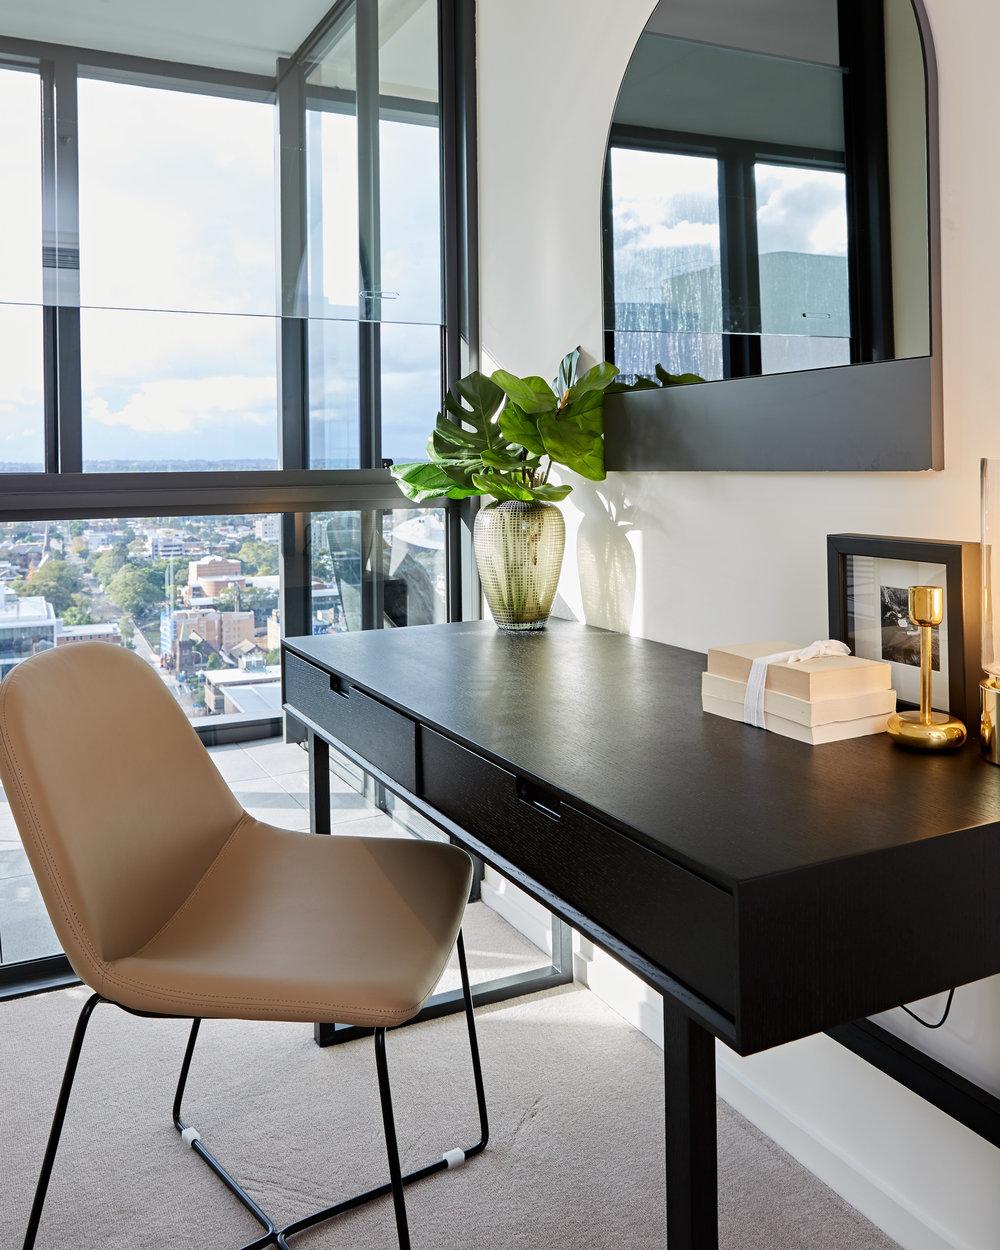 170609_Apartment_shots_33.jpg